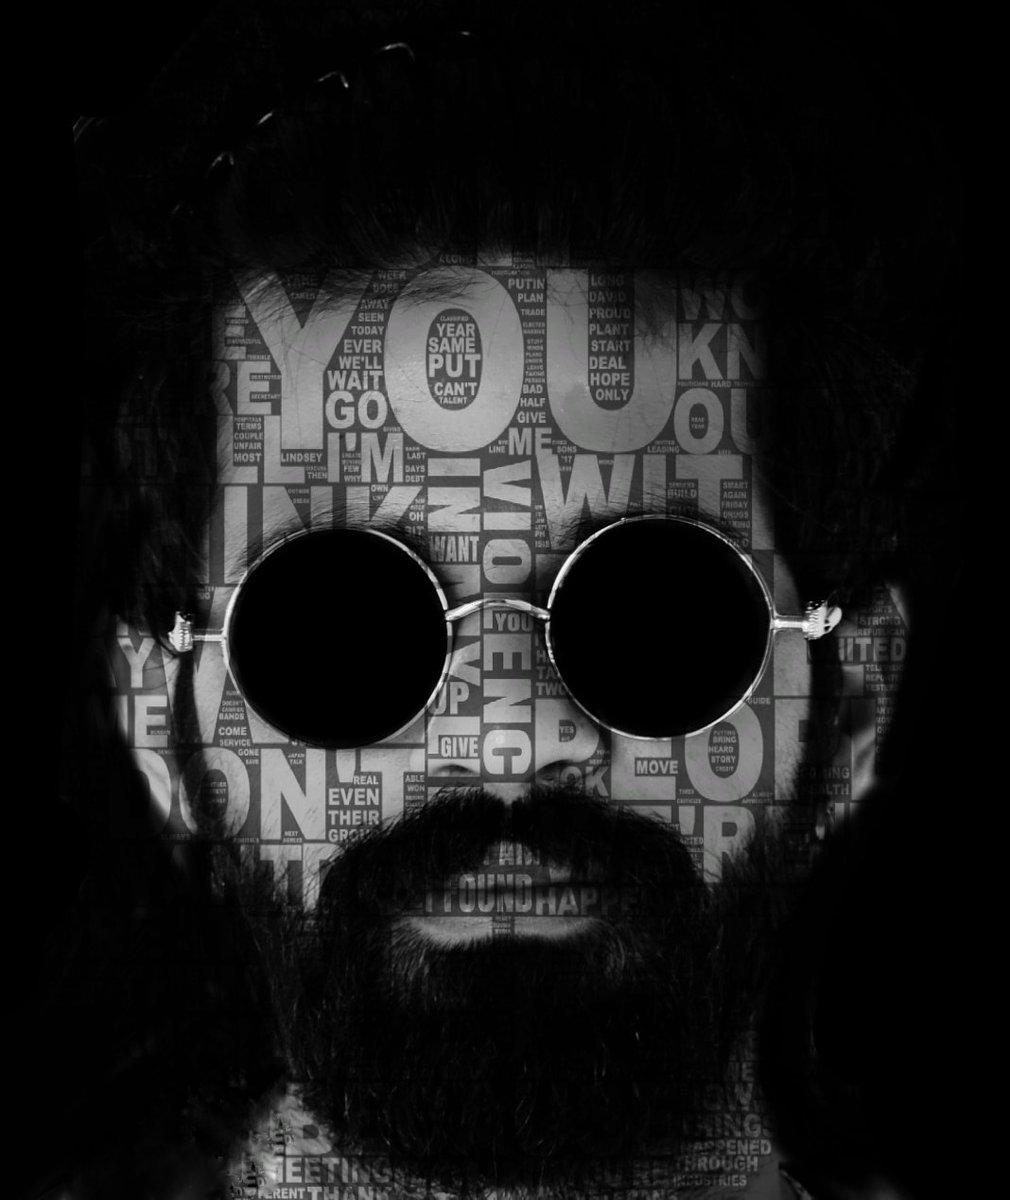 @TheDeverakonda @shahidkapoor   . . . . . . . #arjunreddy #vijaydevarakonda #rowdy #geethagovindam #vijaydeverakonda #vijay #dearcomrade #rashmikamandanna #love #vijaydevarkonda #kabirsingh #arjunreddymania #tollywood #thedeverakonda #shalinipandey #rashmika #telugu #bollywoodpic.twitter.com/53YpEipSrZ